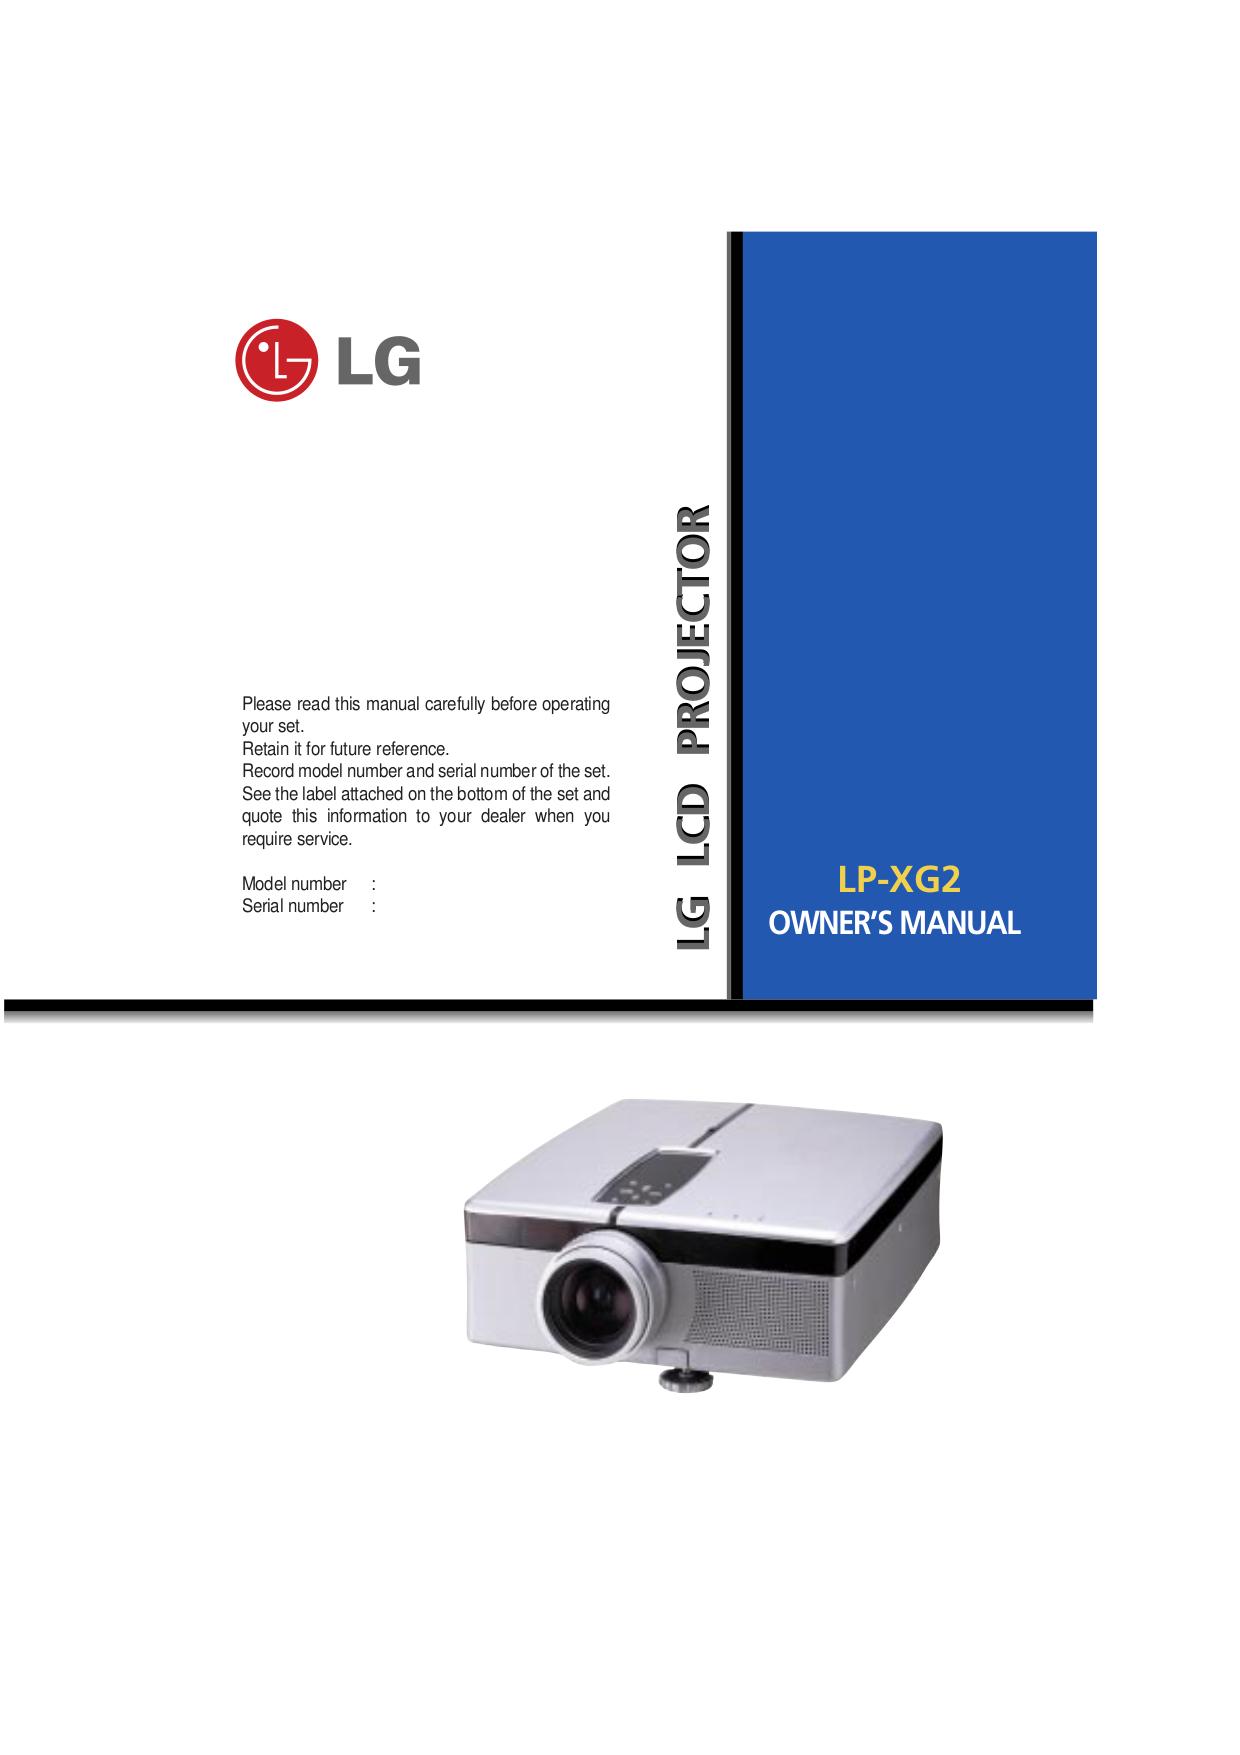 pdf for LG Projector LP-XG2 manual